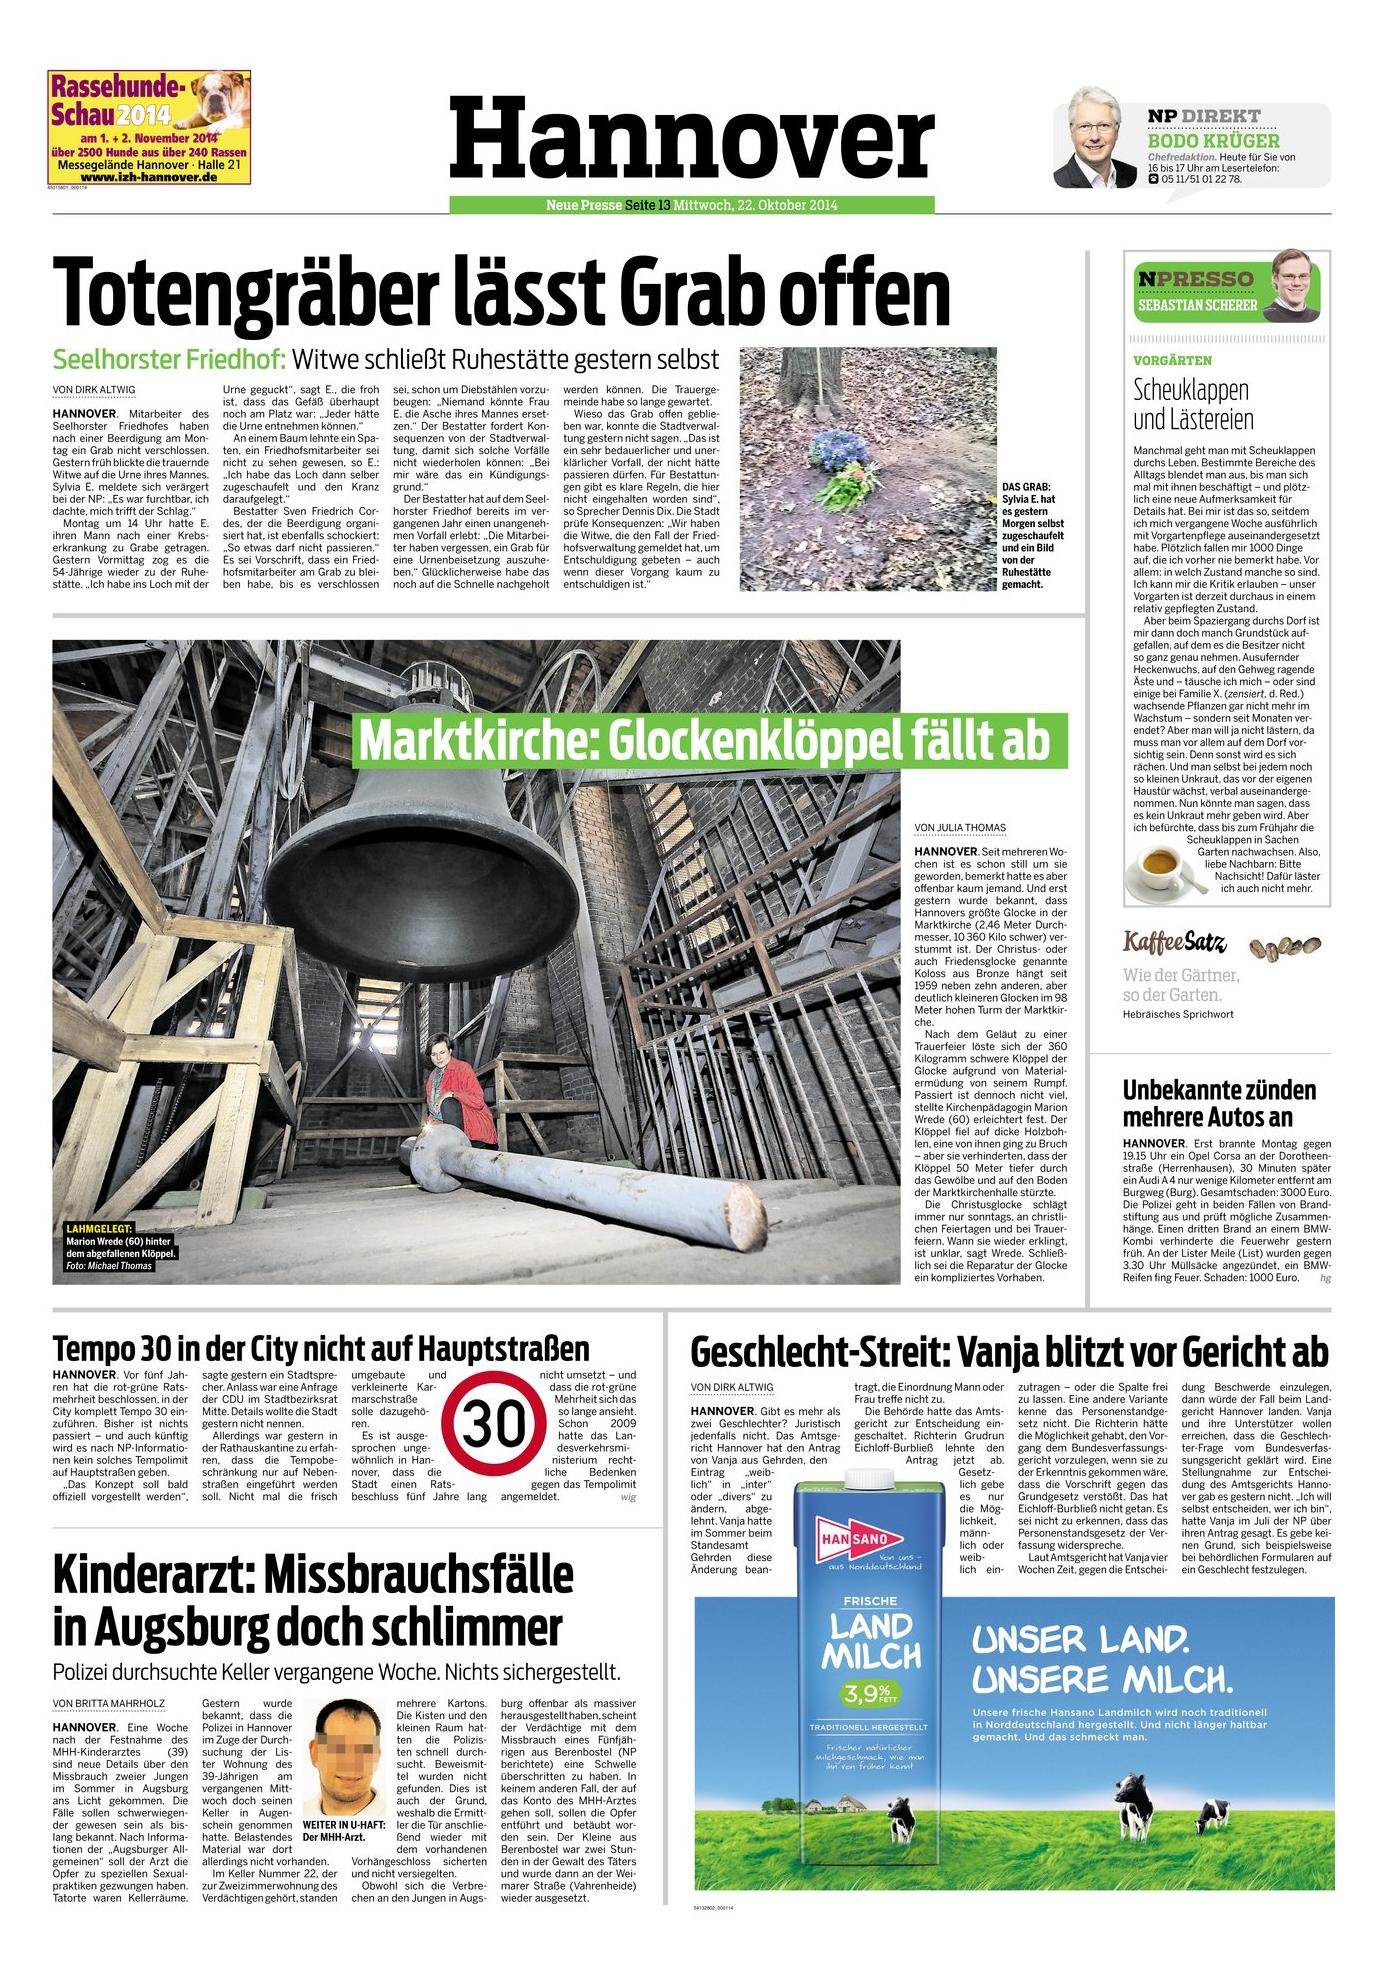 Hannover, Presse, Bestattung